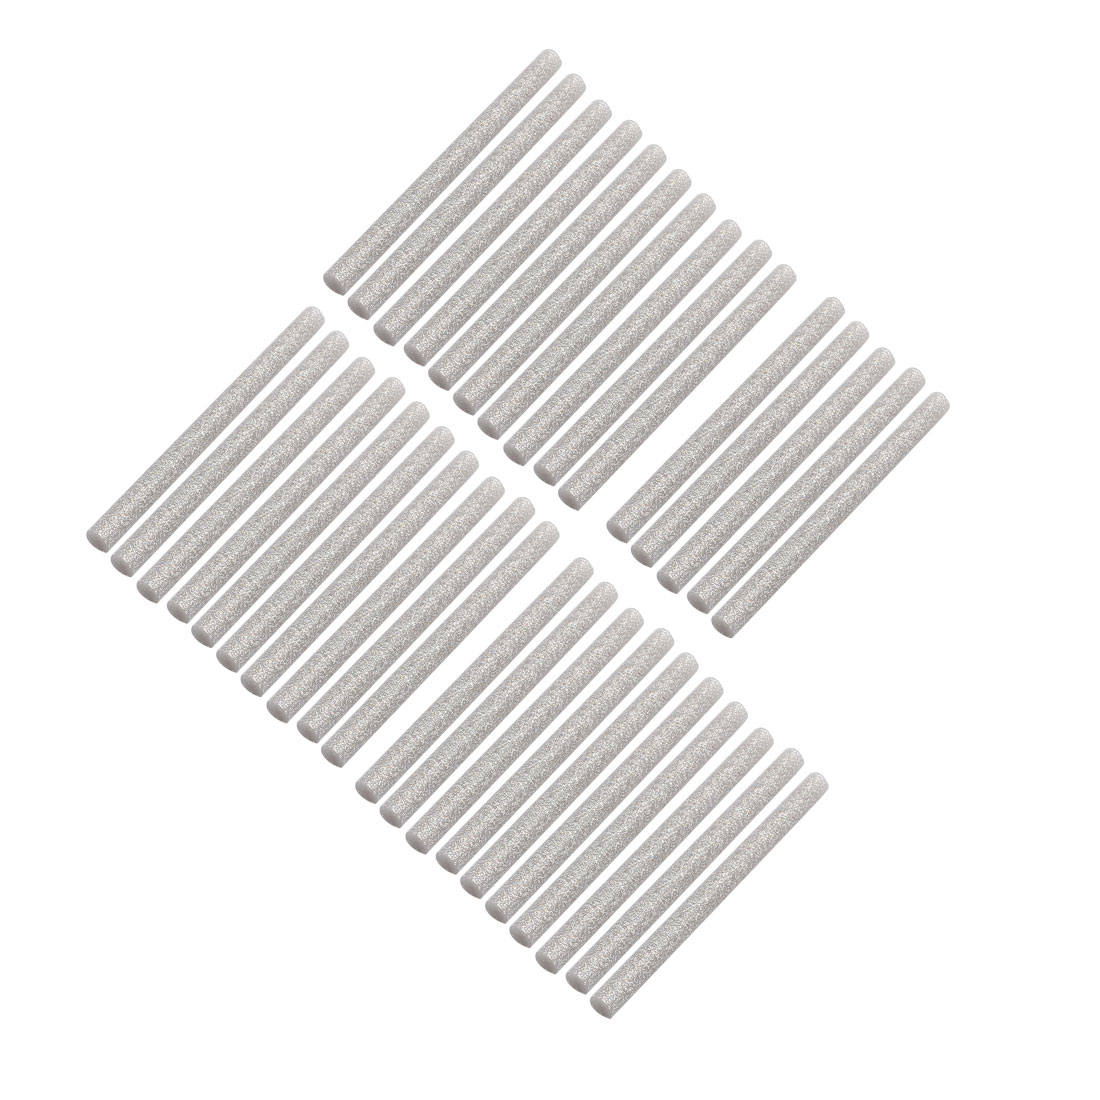 35pcs 7mm x 100mm Hot Melt Glue Sticks Silver Tone for DIY Small Craft Projects